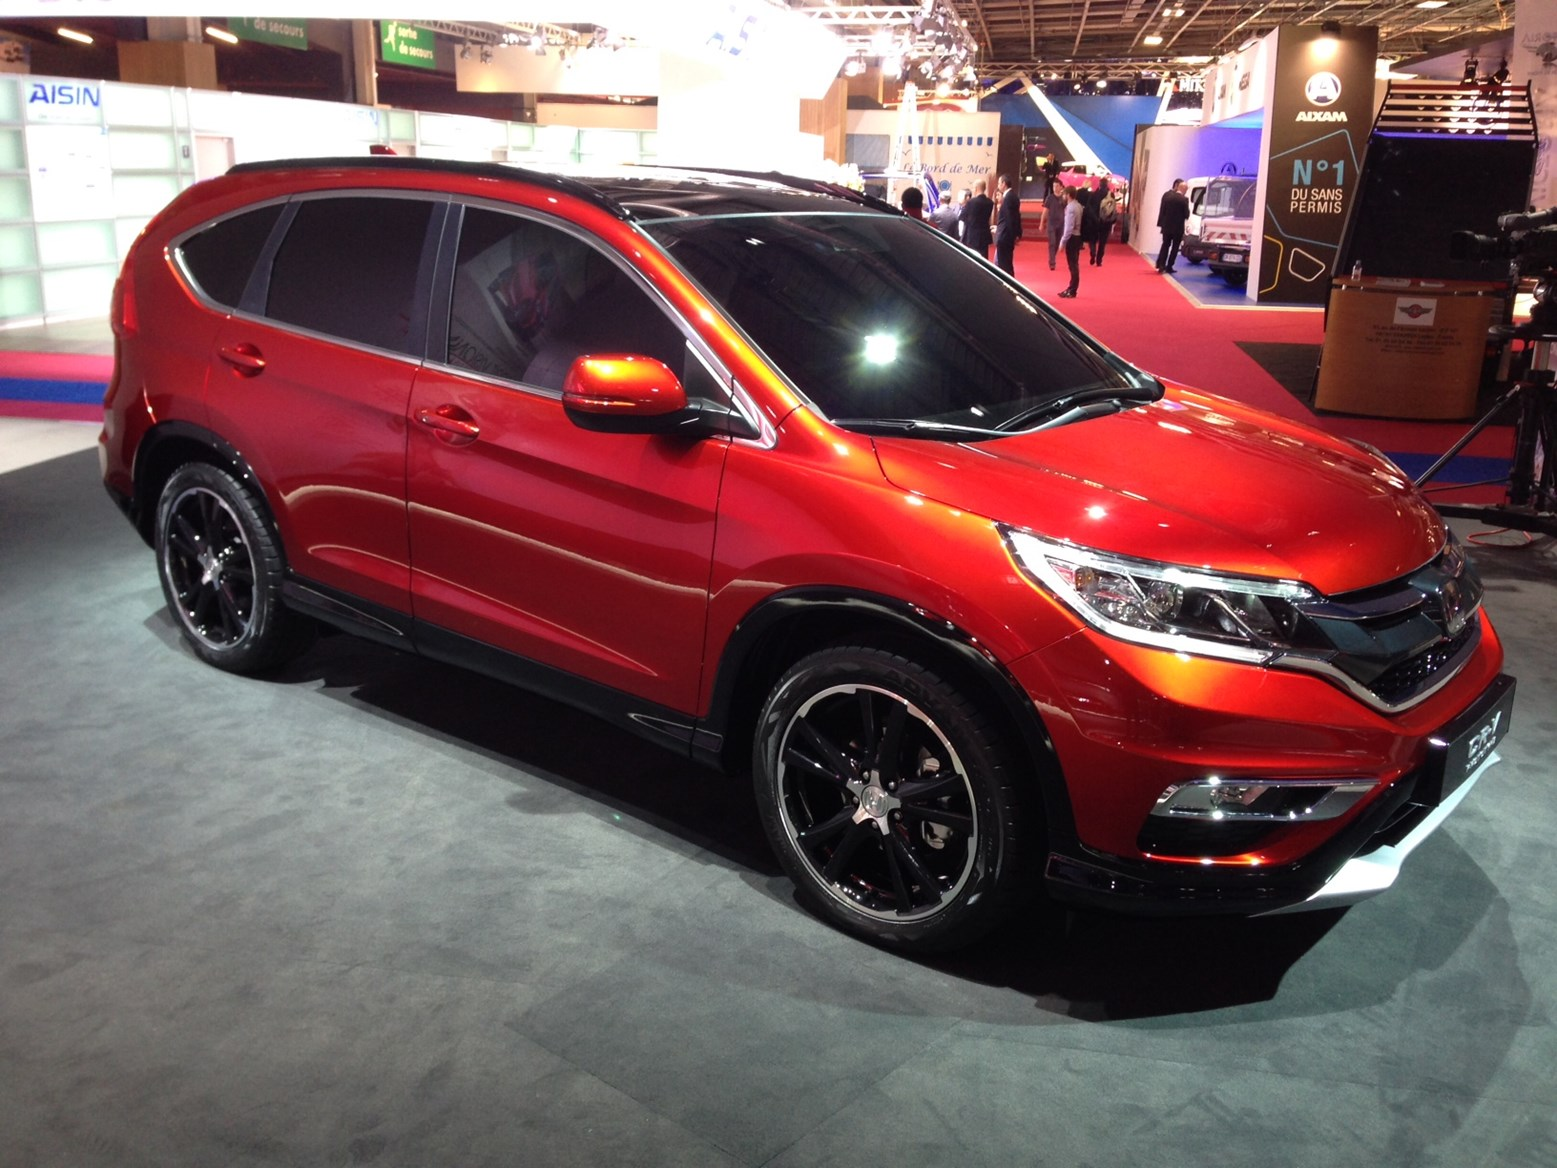 Paris Motor Show 2014: Honda | Parkers